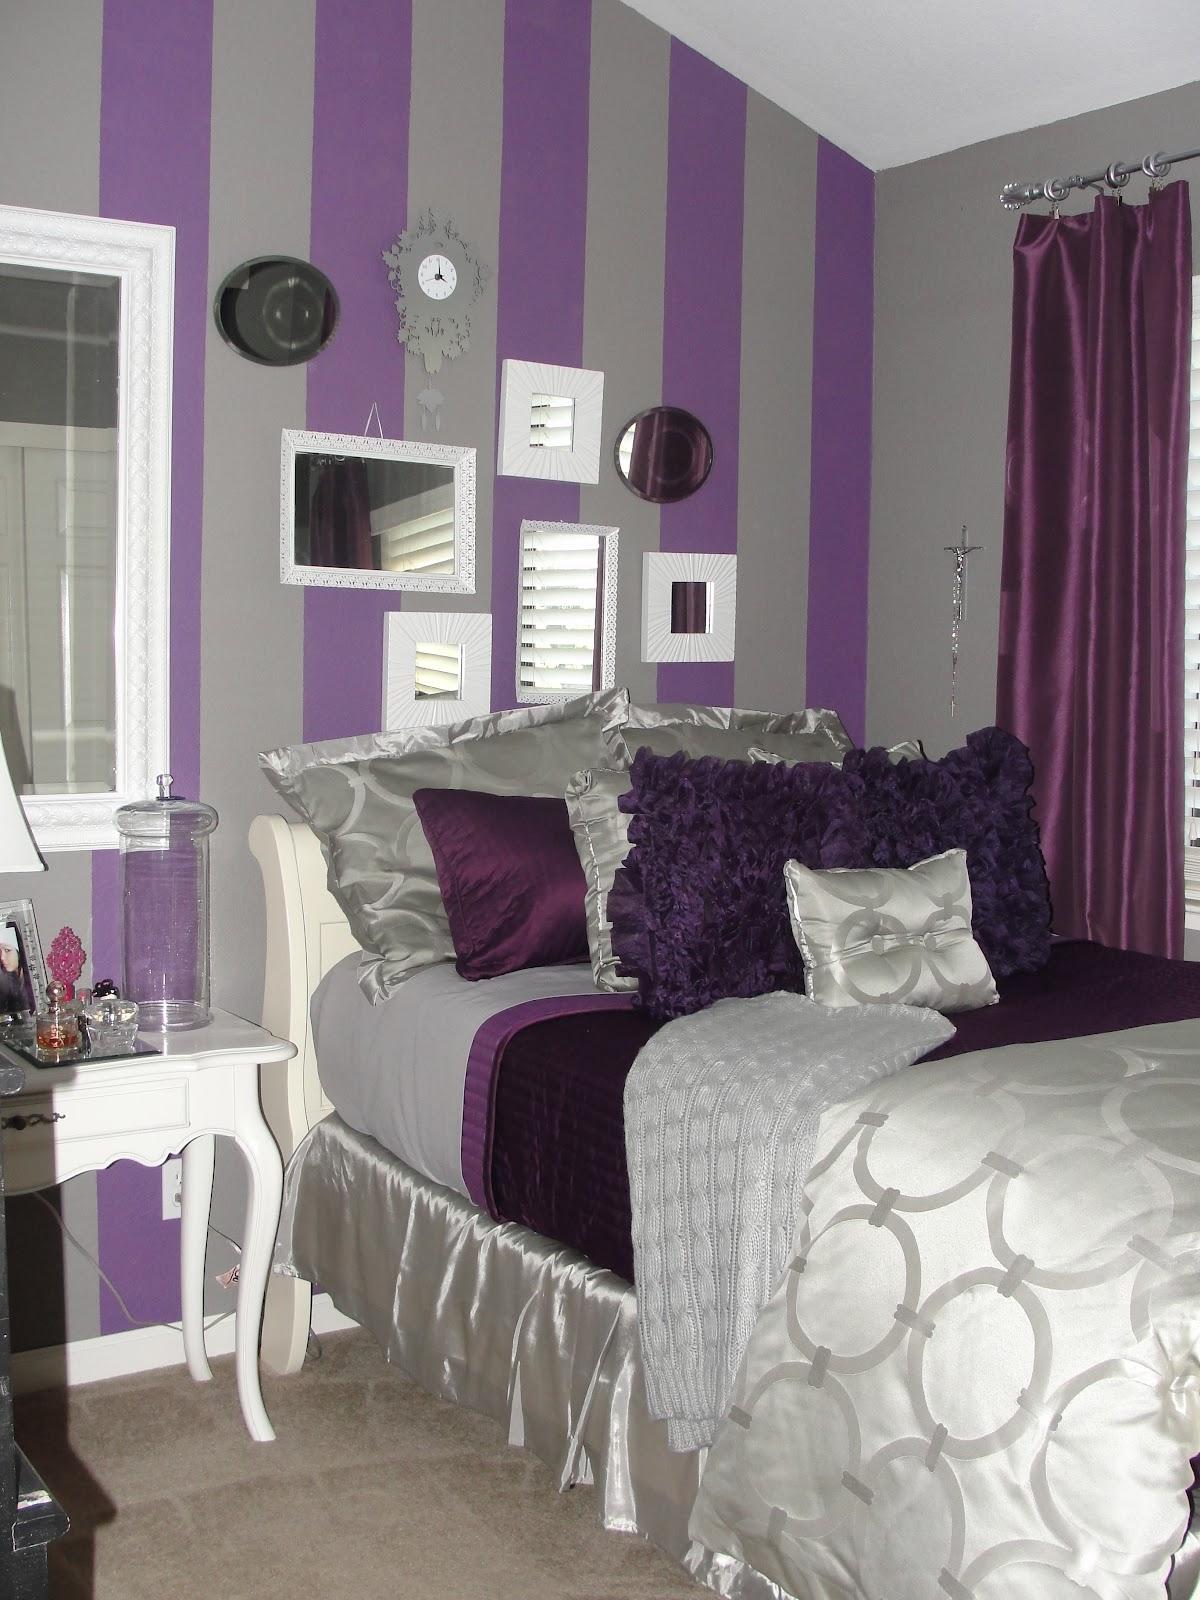 kl royal purple room decor